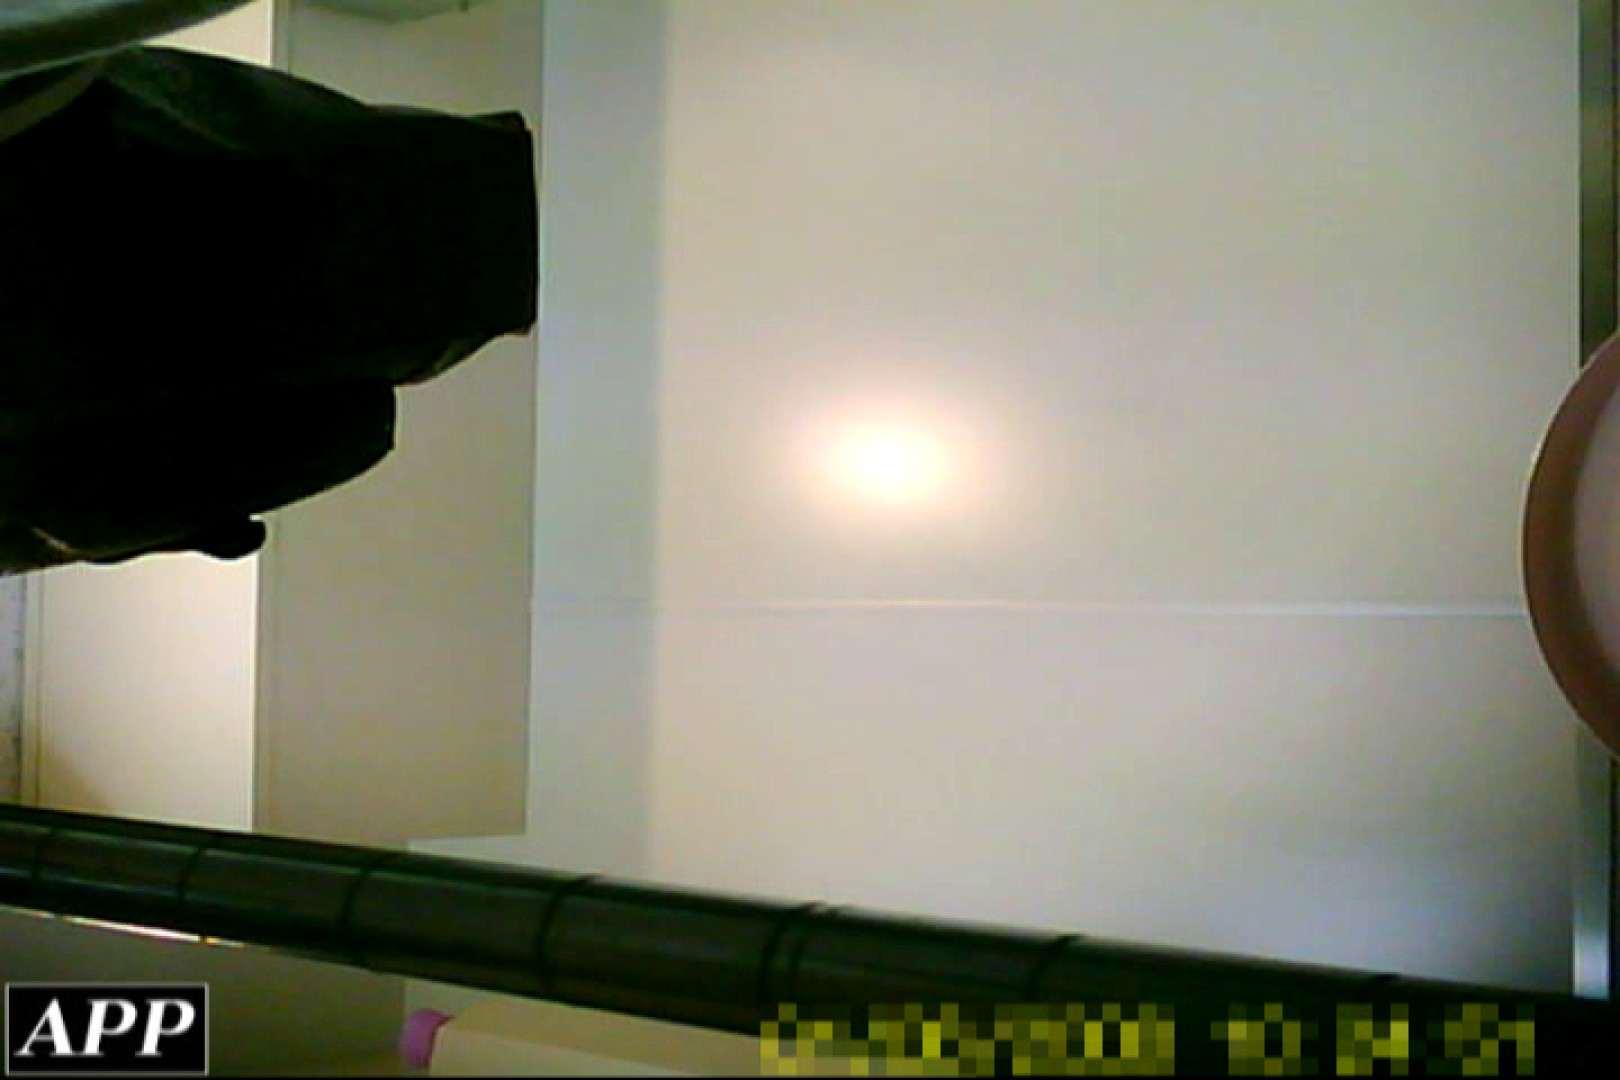 3視点洗面所 vol.087 OLエロ画像  83PICs 34